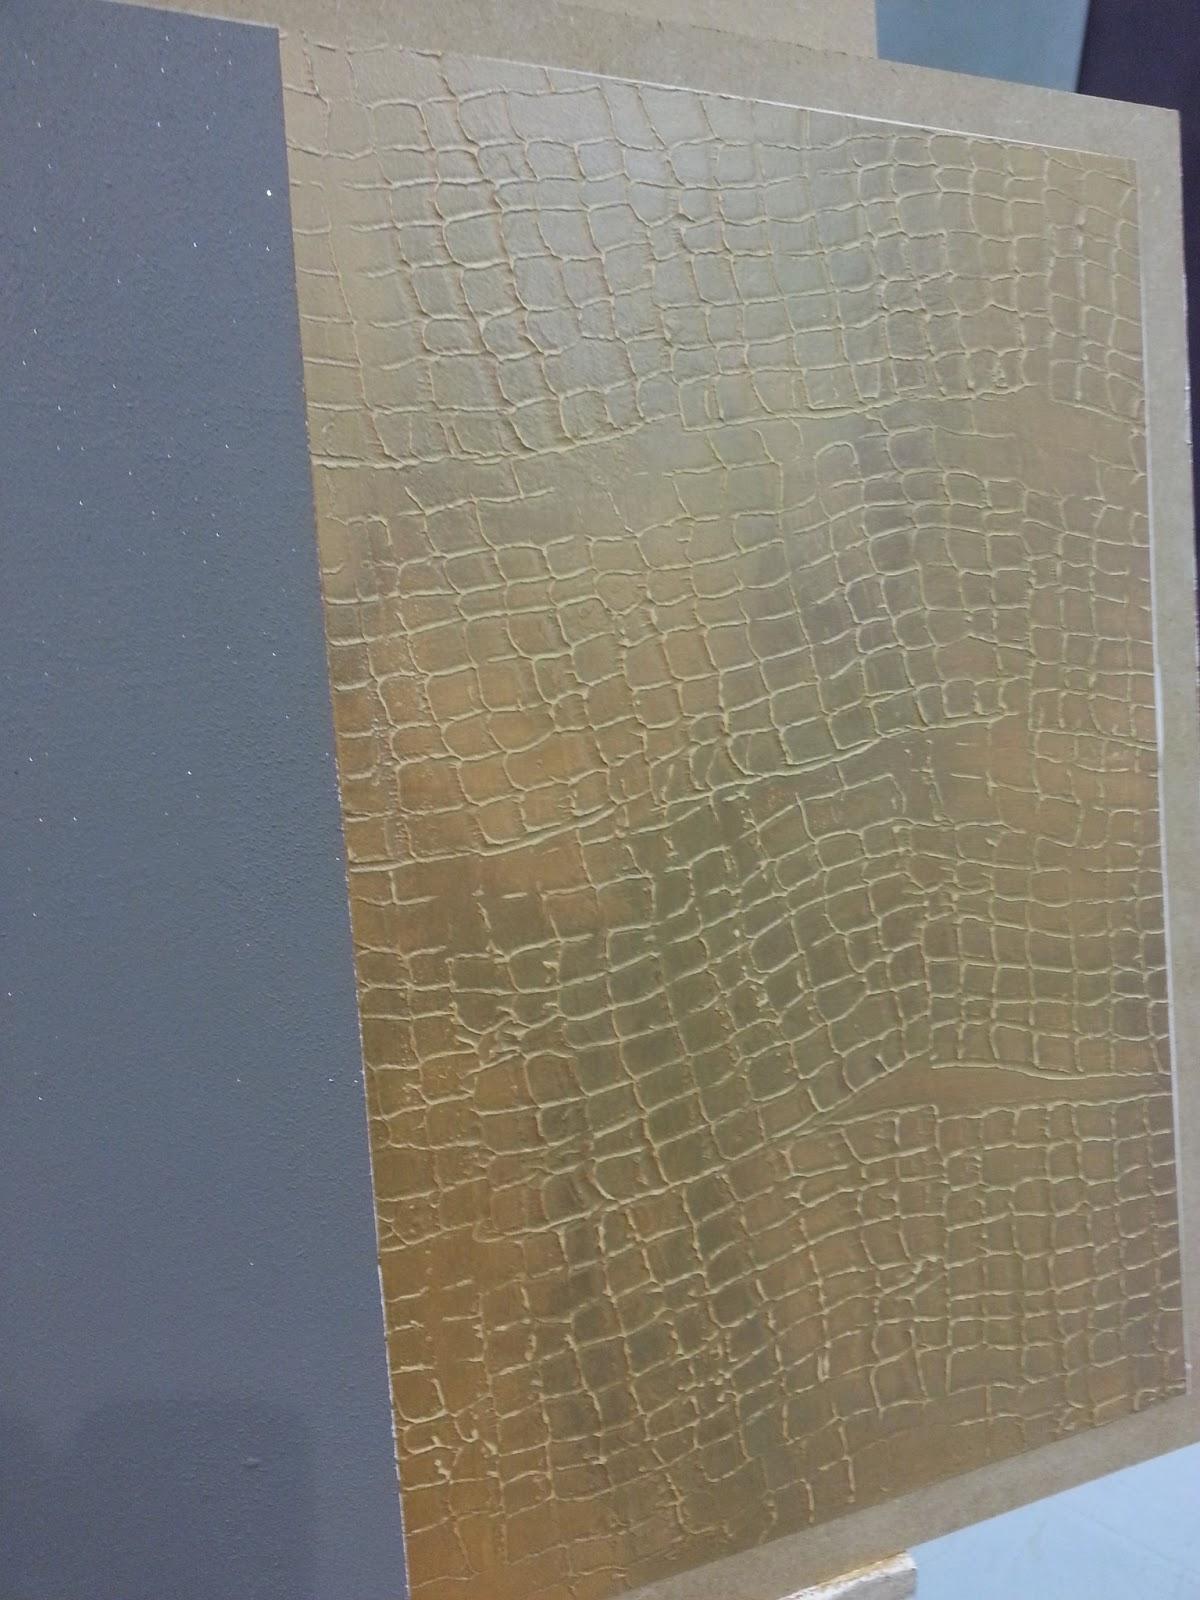 Peinture effet d mo leroy merlin massy gamme empreinte et paillette cours de - Leroy merlin massy ...